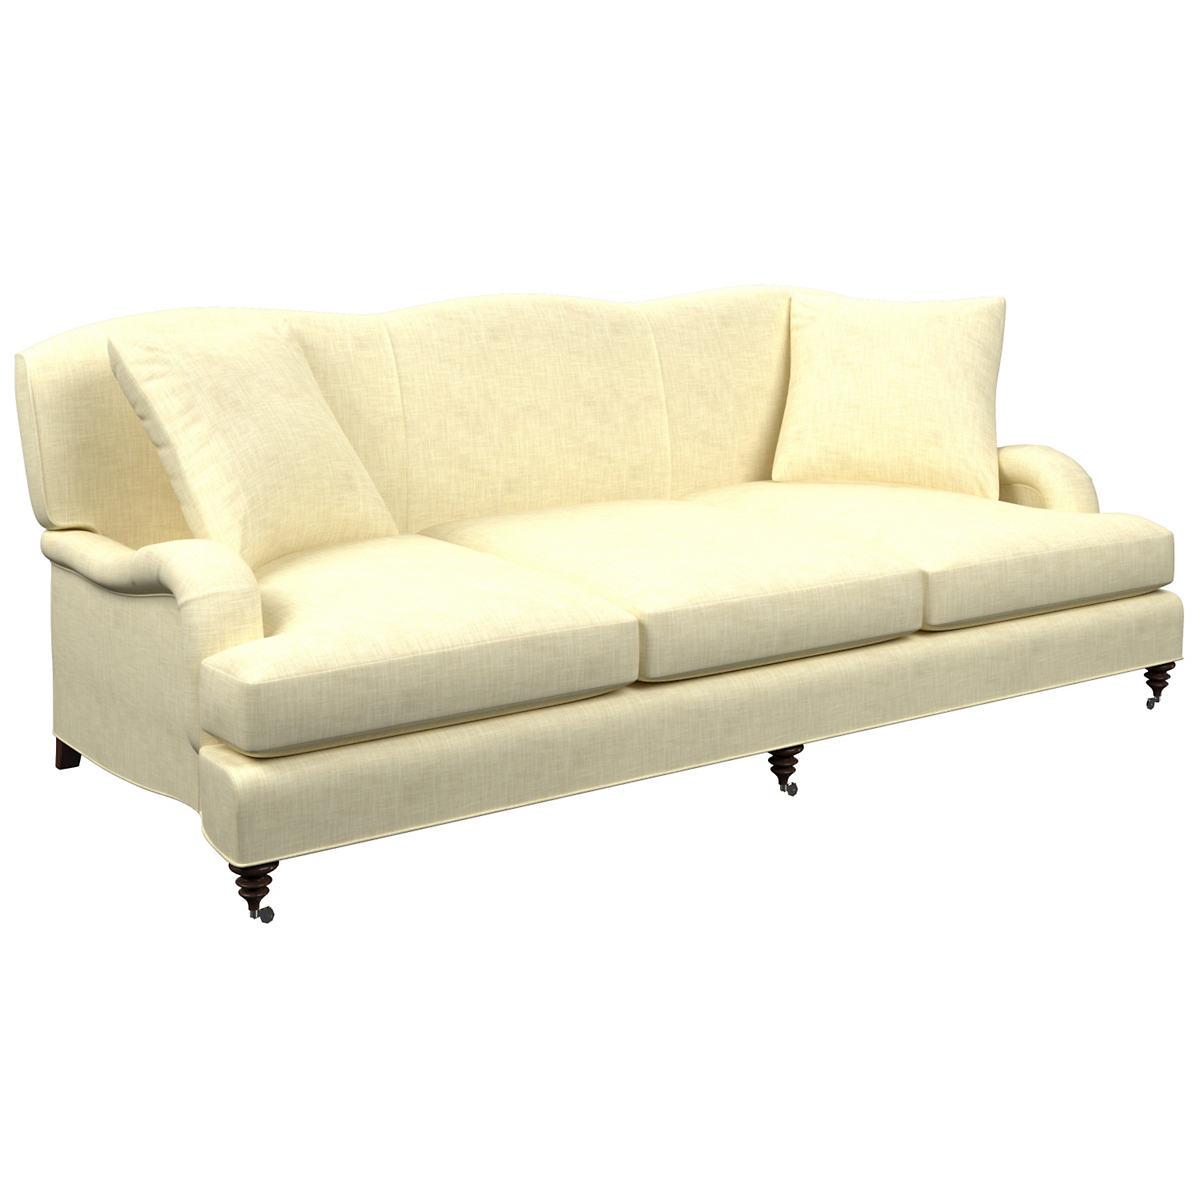 Greylock Ivory Litchfield 3 Seater Sofa